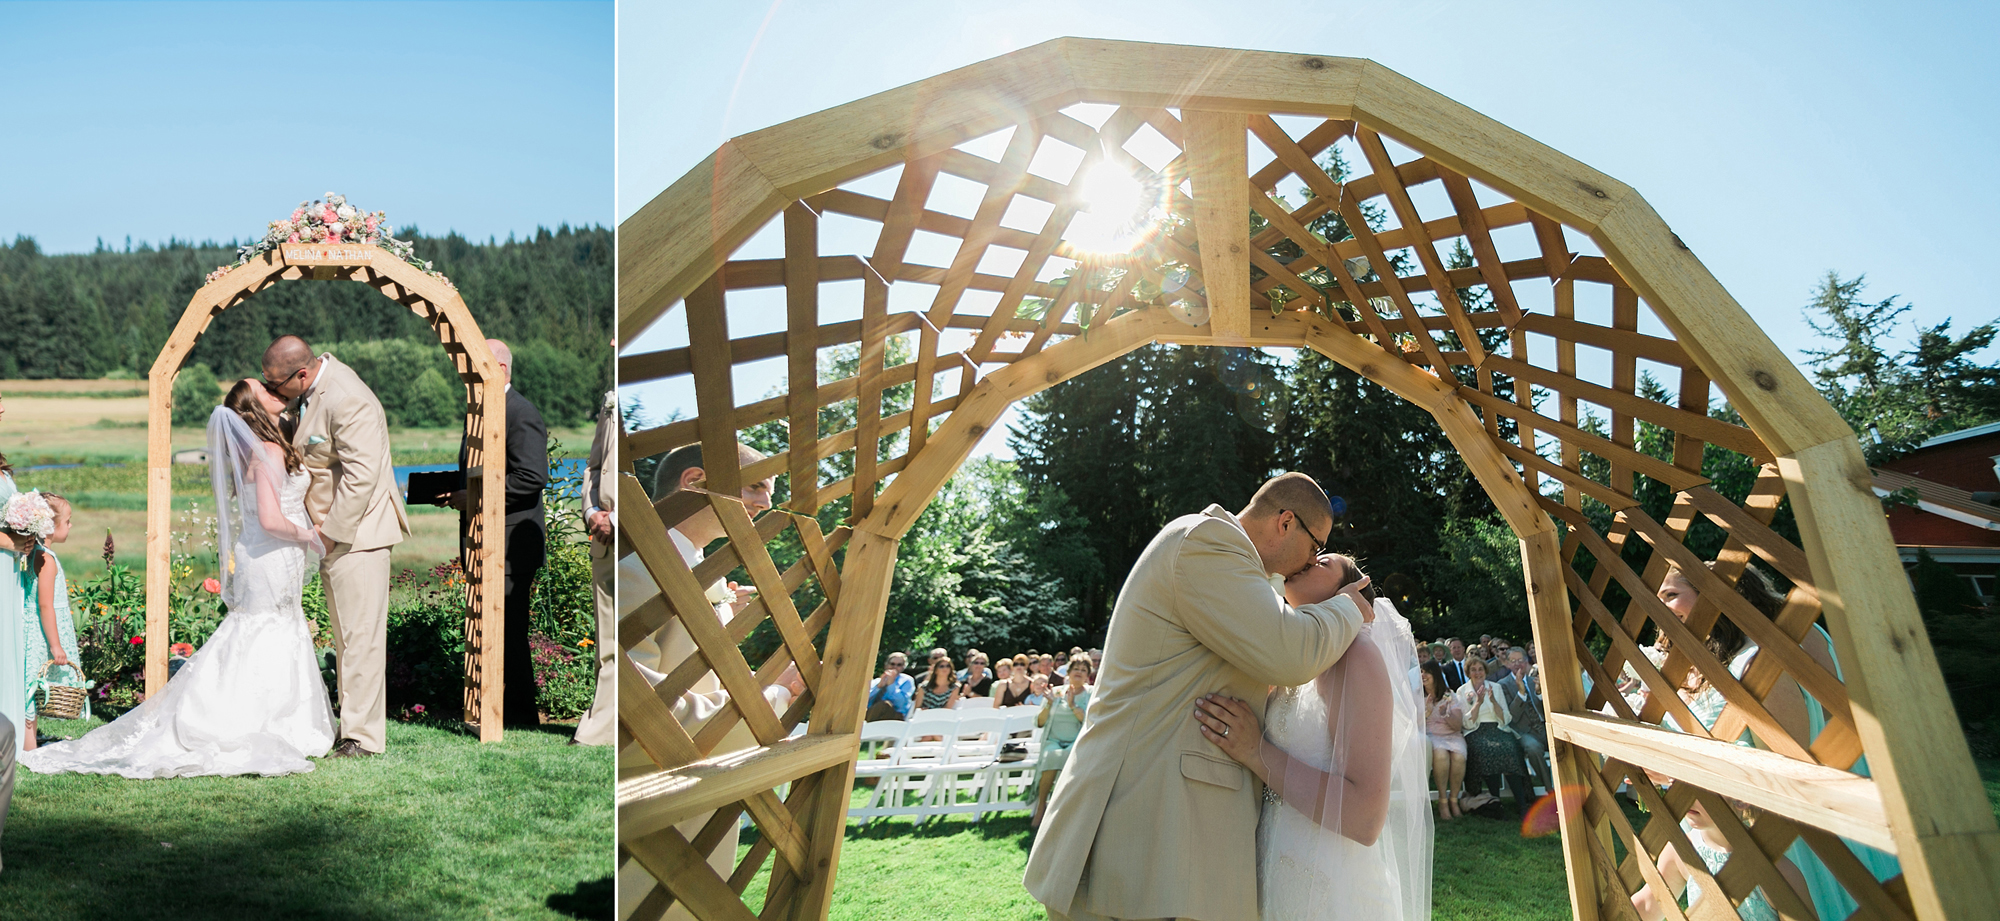 ashley vos photography seattle area wedding photographer_0561.jpg